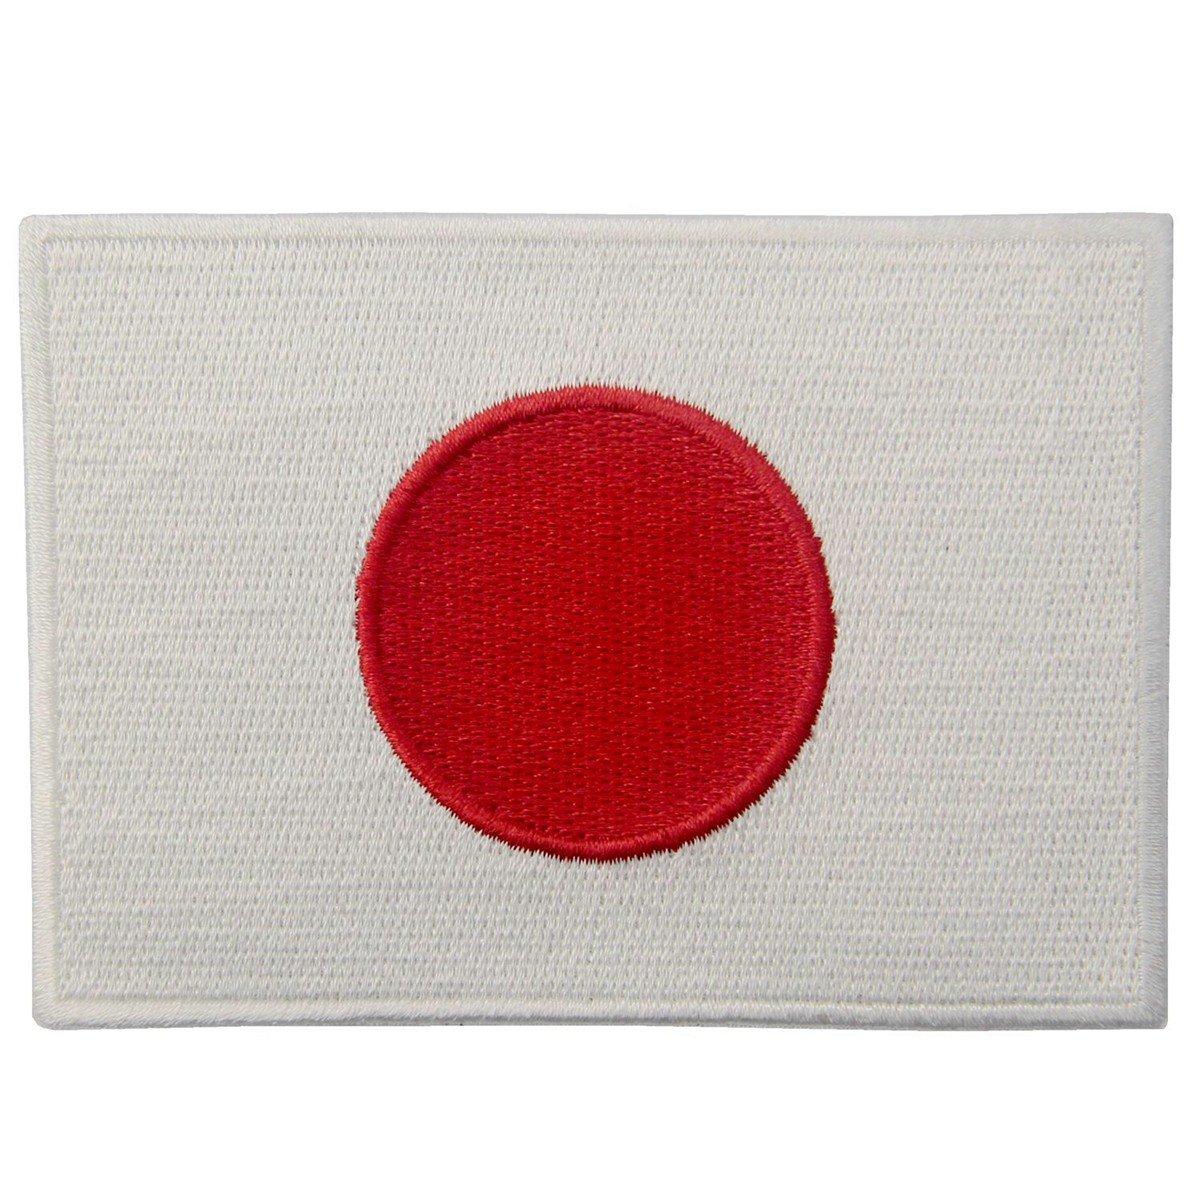 Bandera japonesa Etiqueta autoadhesiva